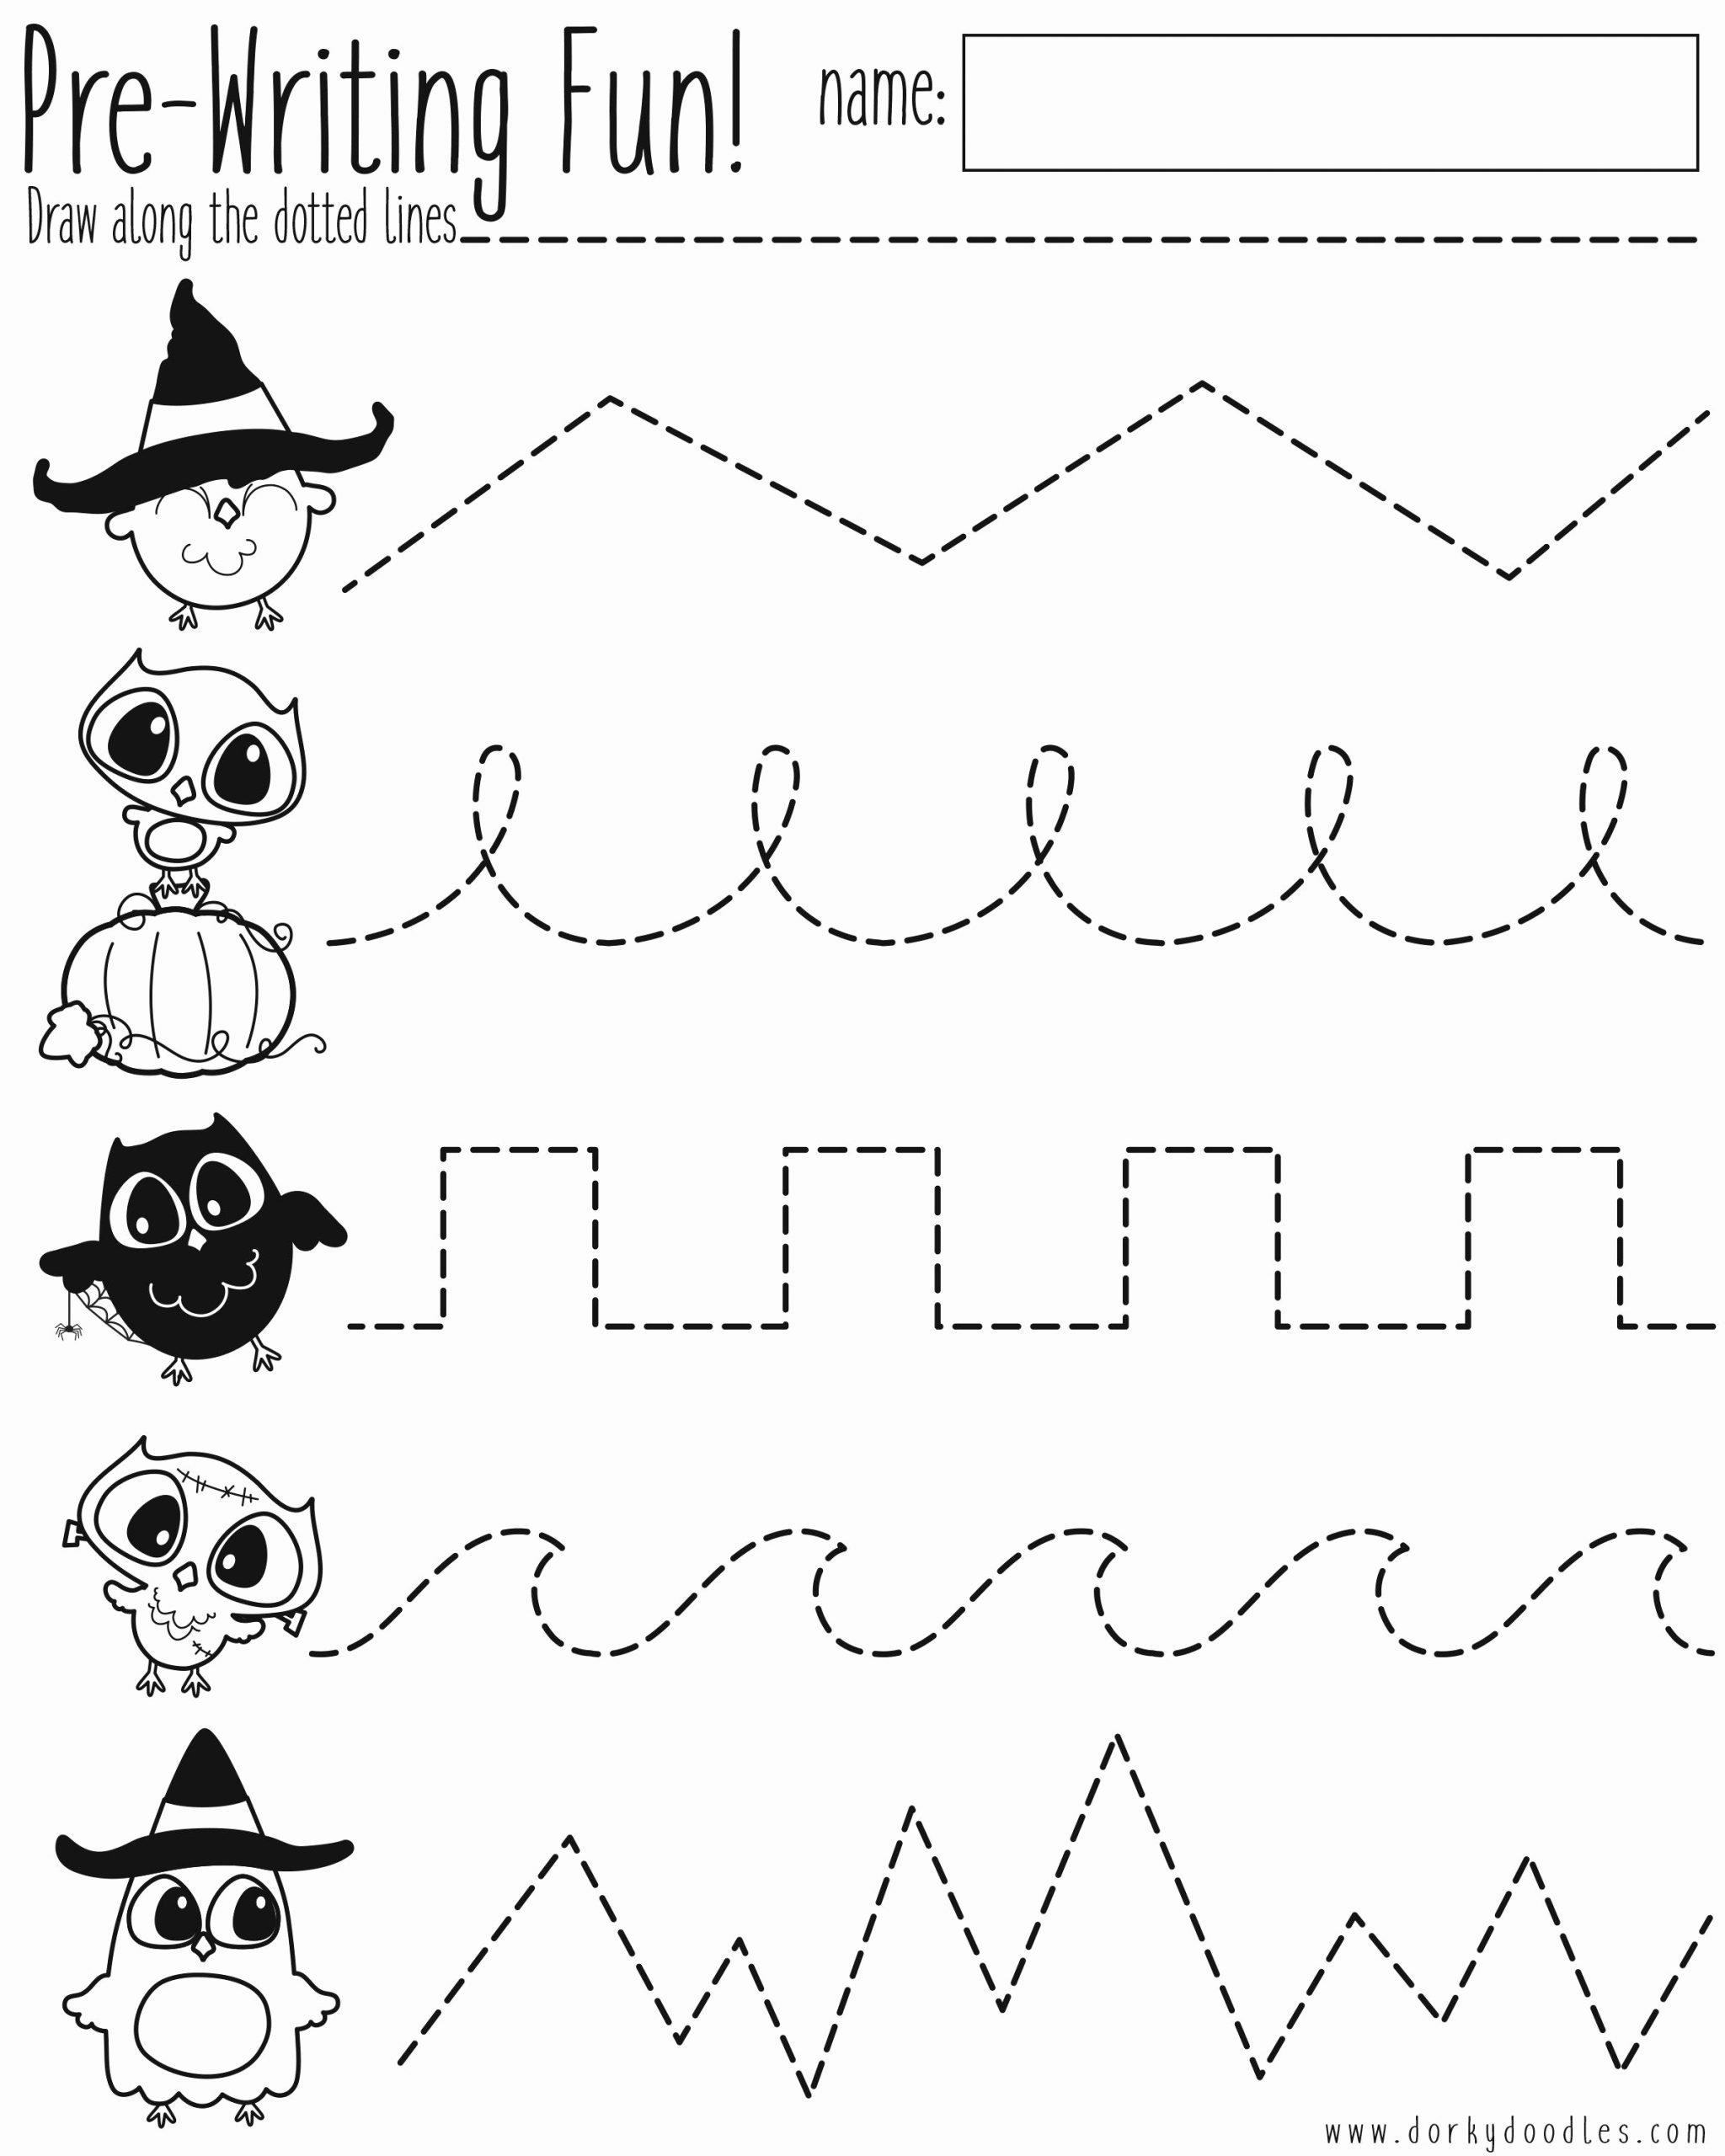 Prewriting Worksheets for Preschoolers New Pre Writing Practice Halloween Worksheet – Dorky Doodles